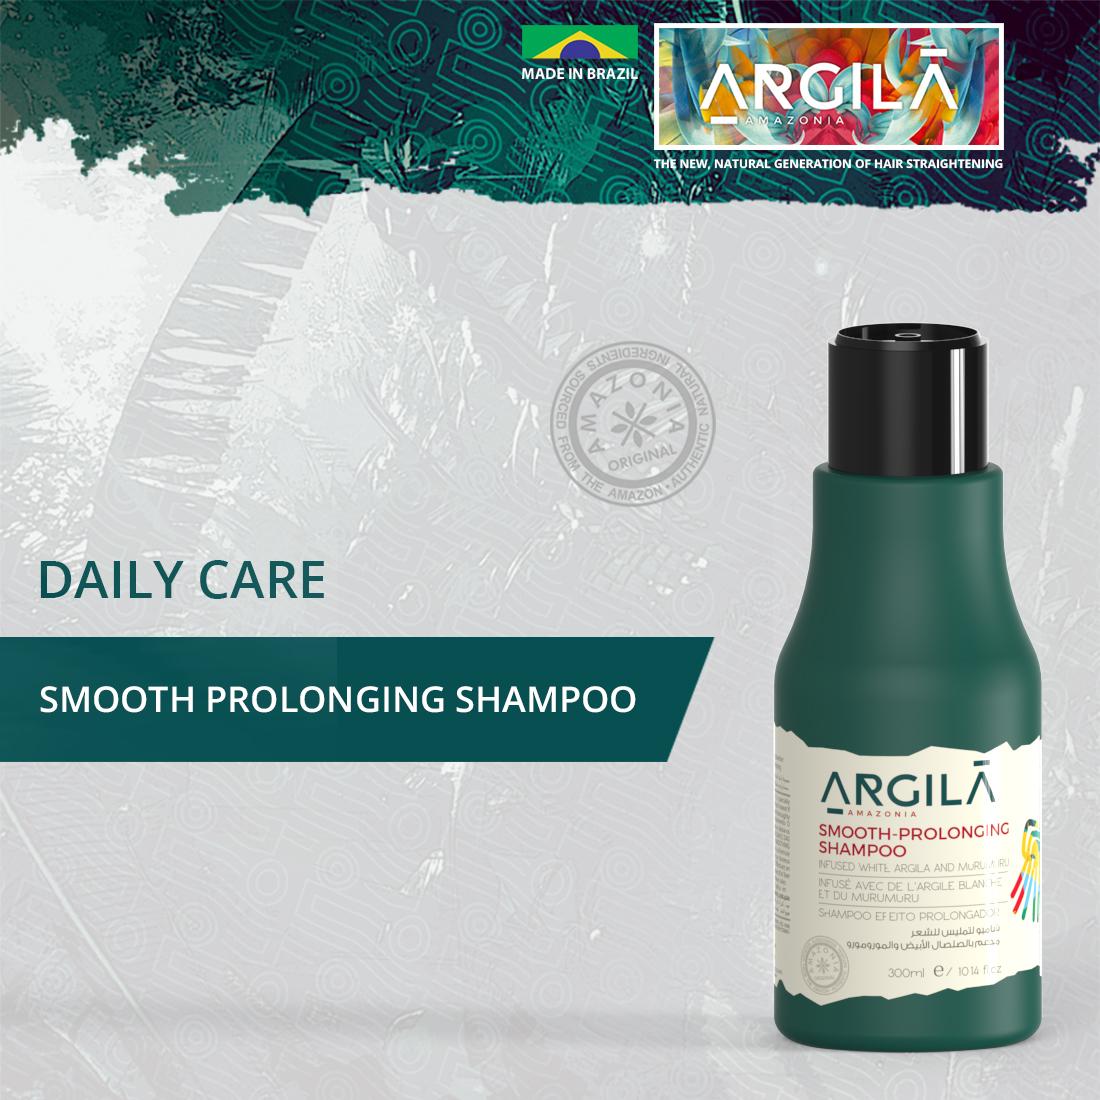 Media Kit Argila Amazônia 8.jpg